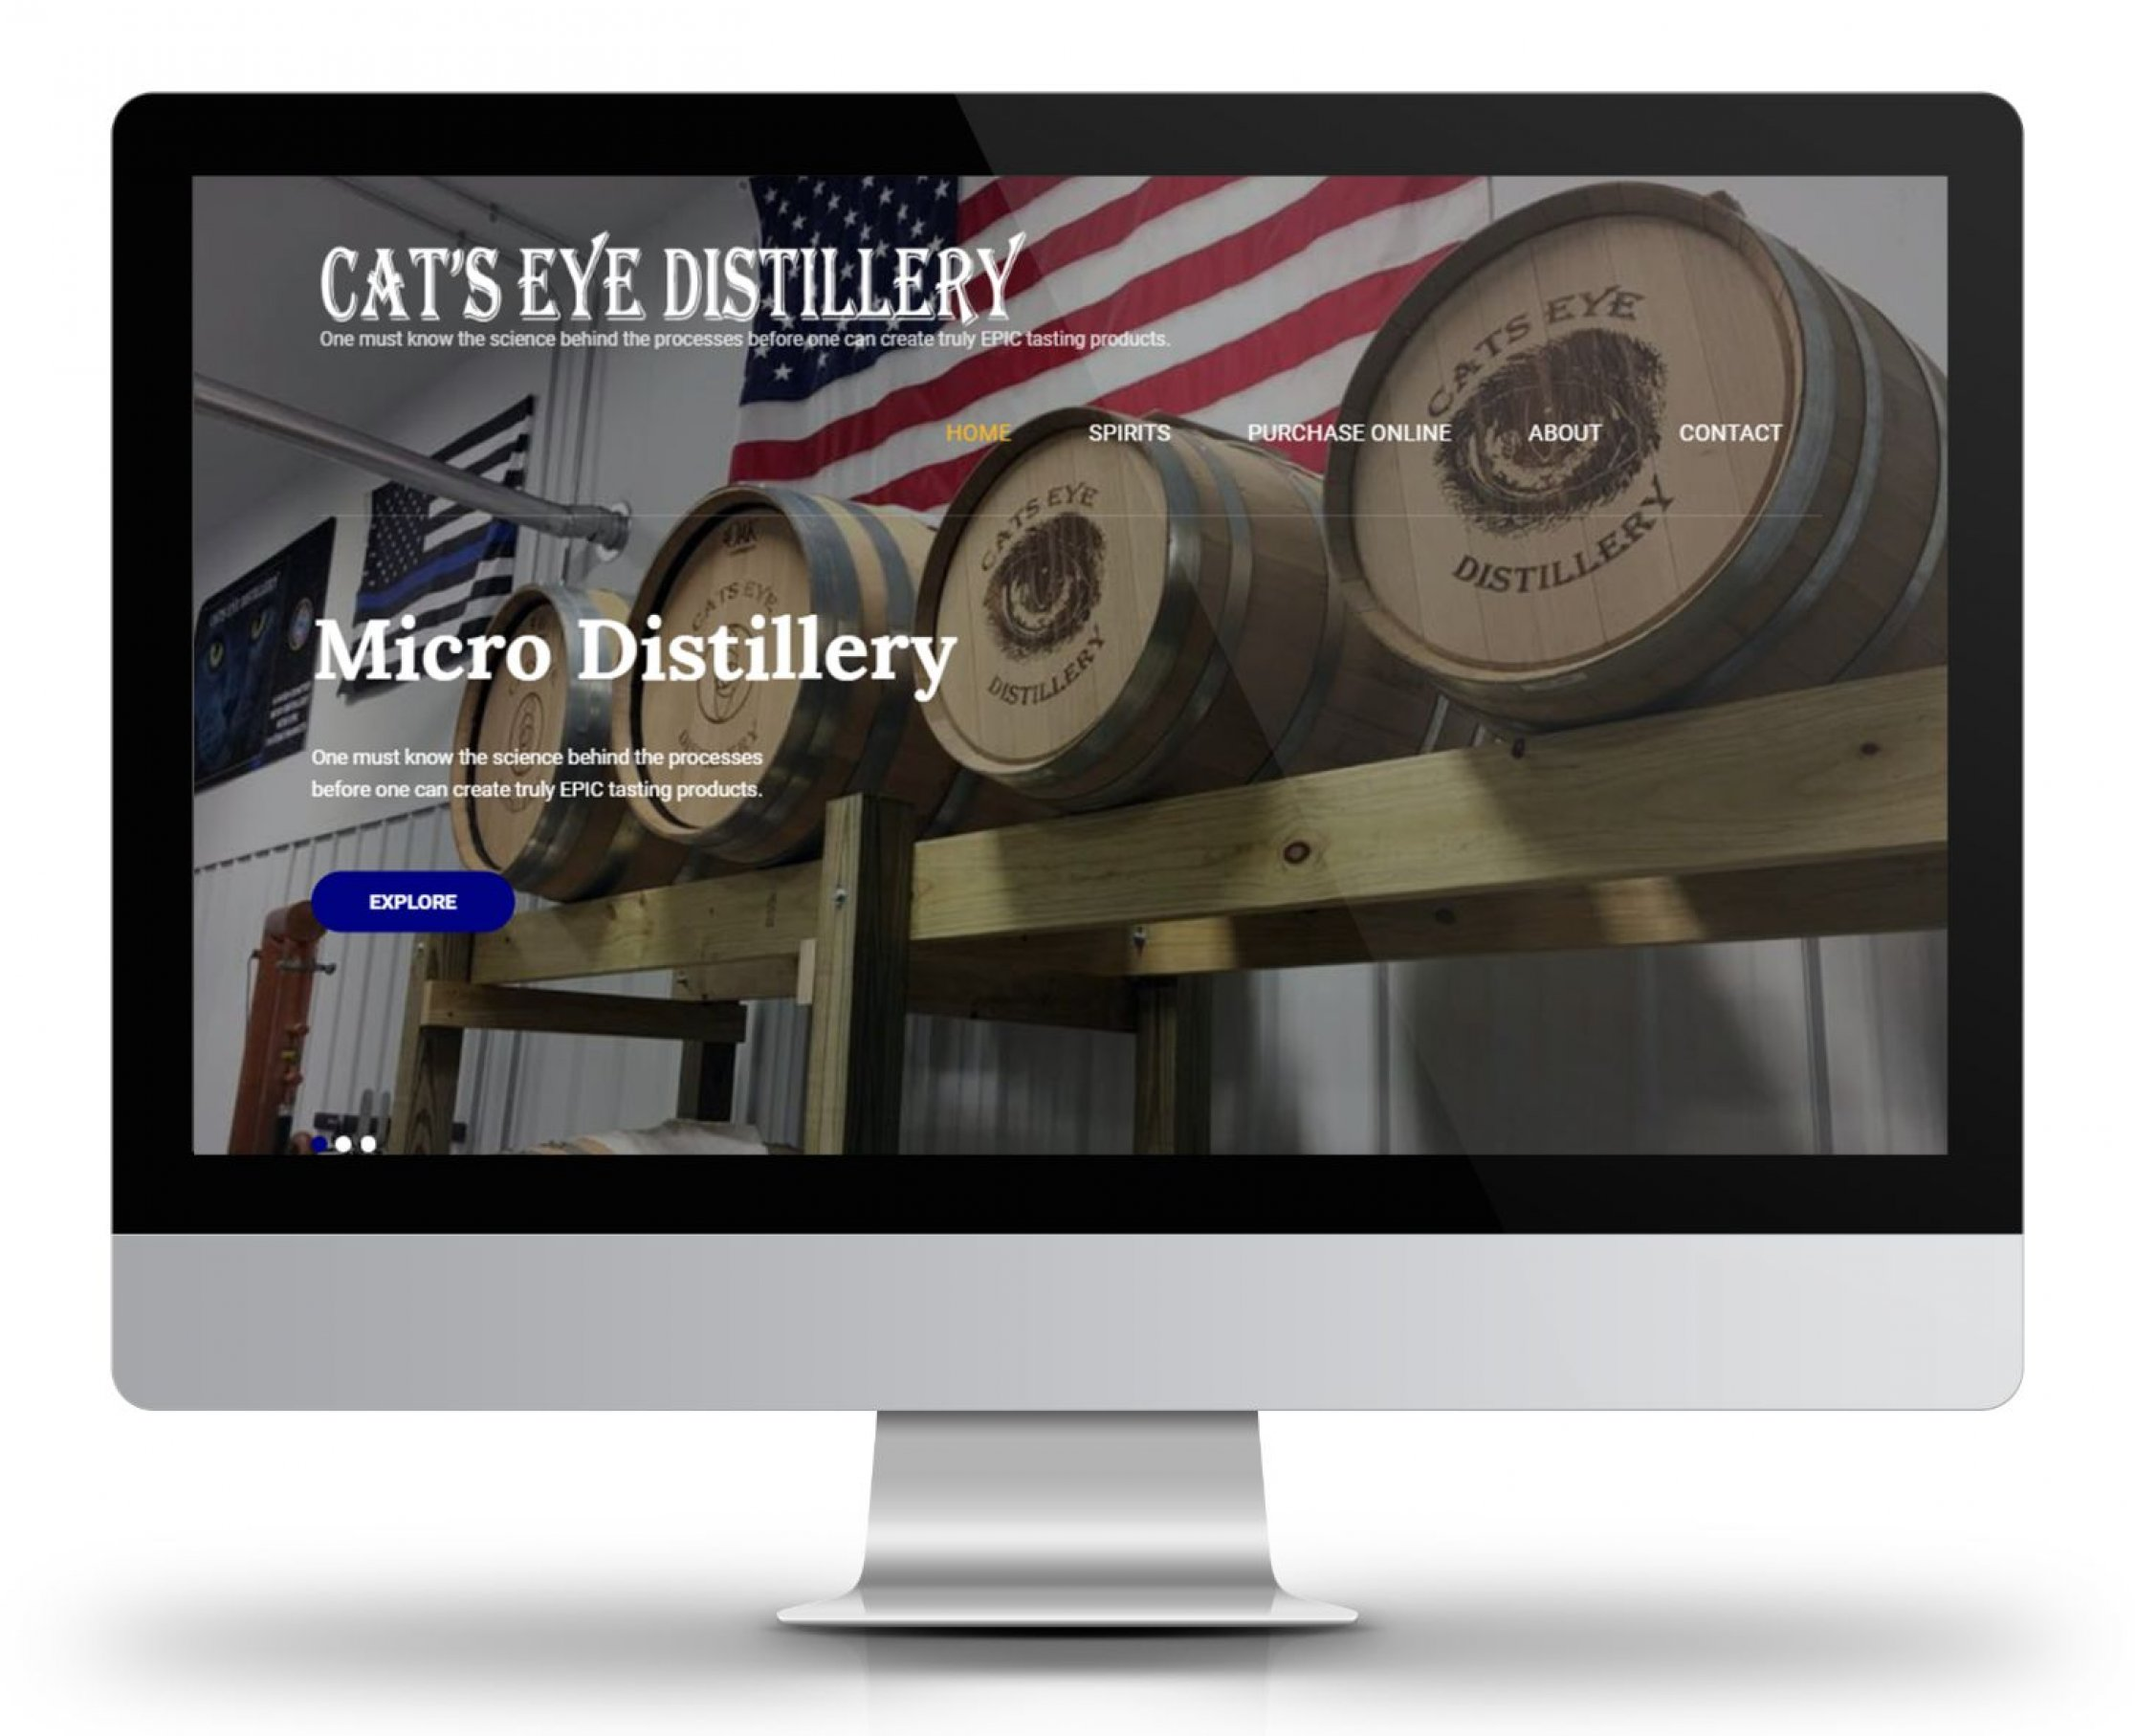 Cat's Eye Distillery